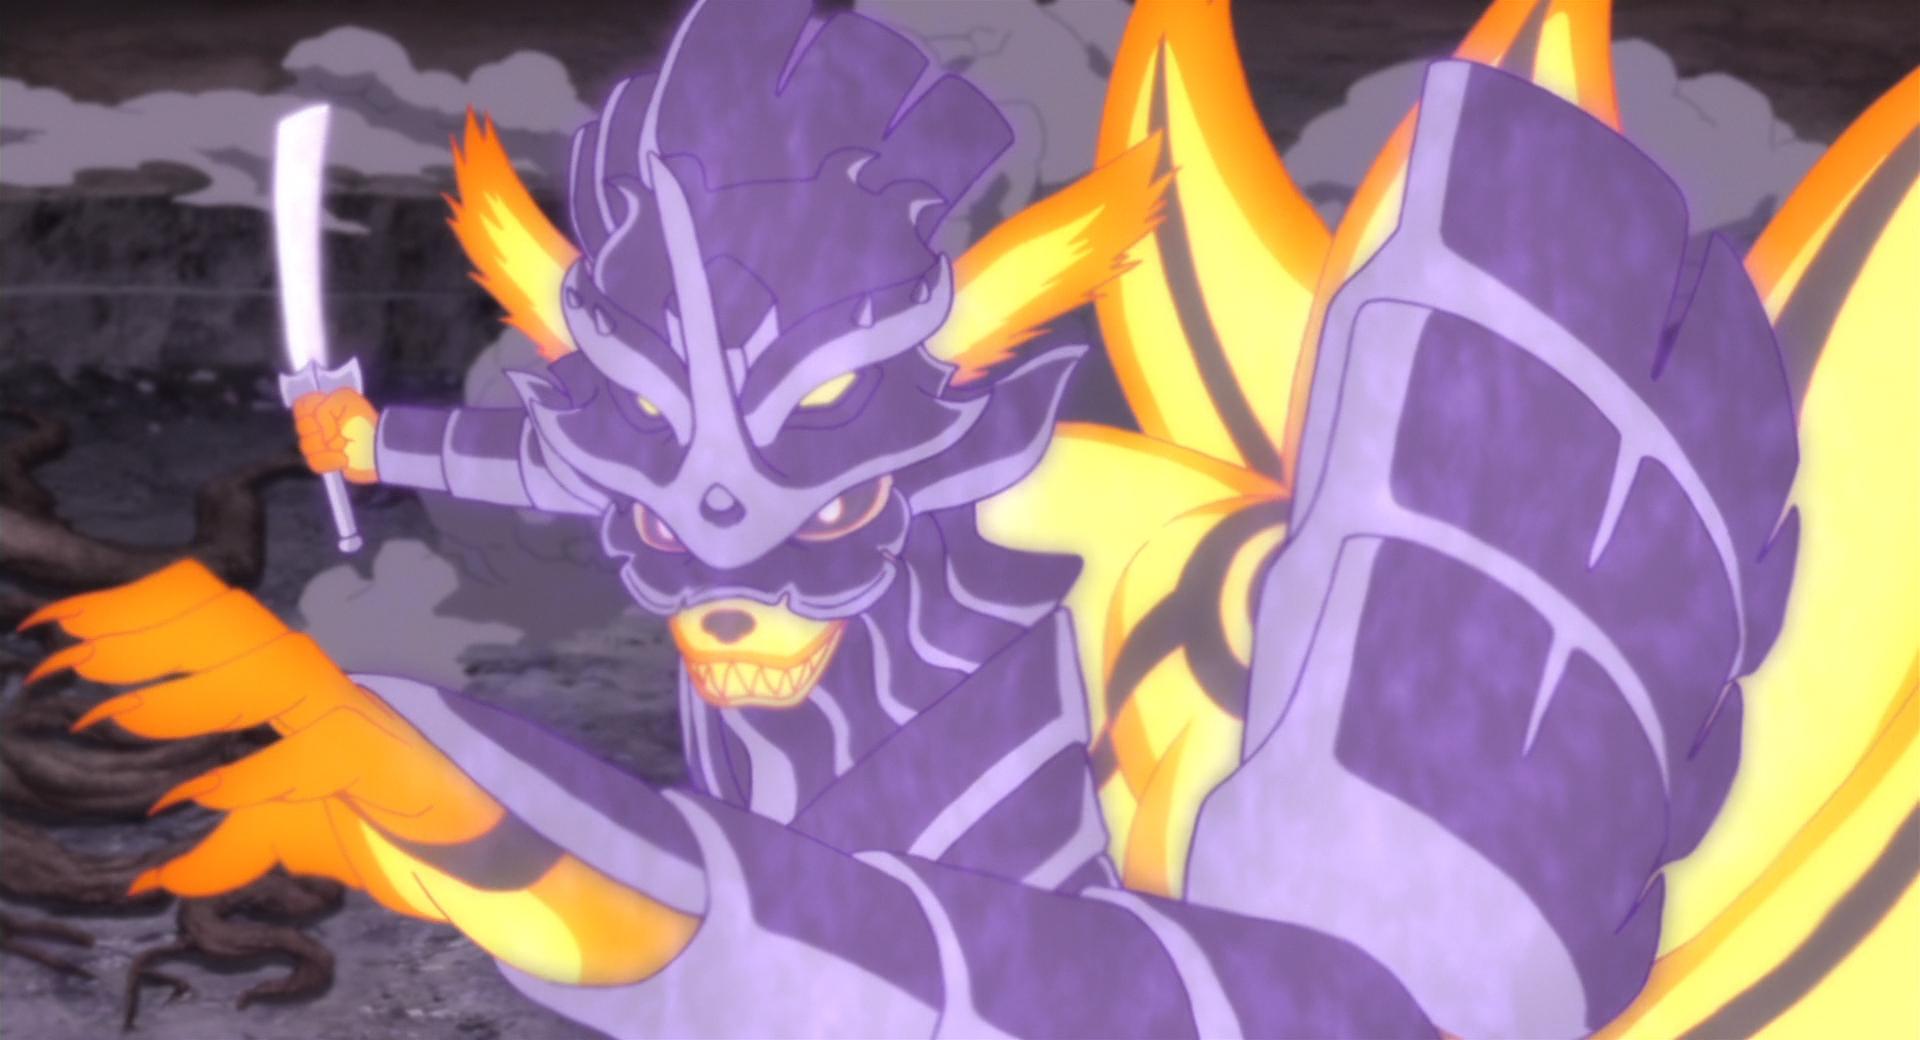 Naruto episode 50 animepremium - Descendants of darkness